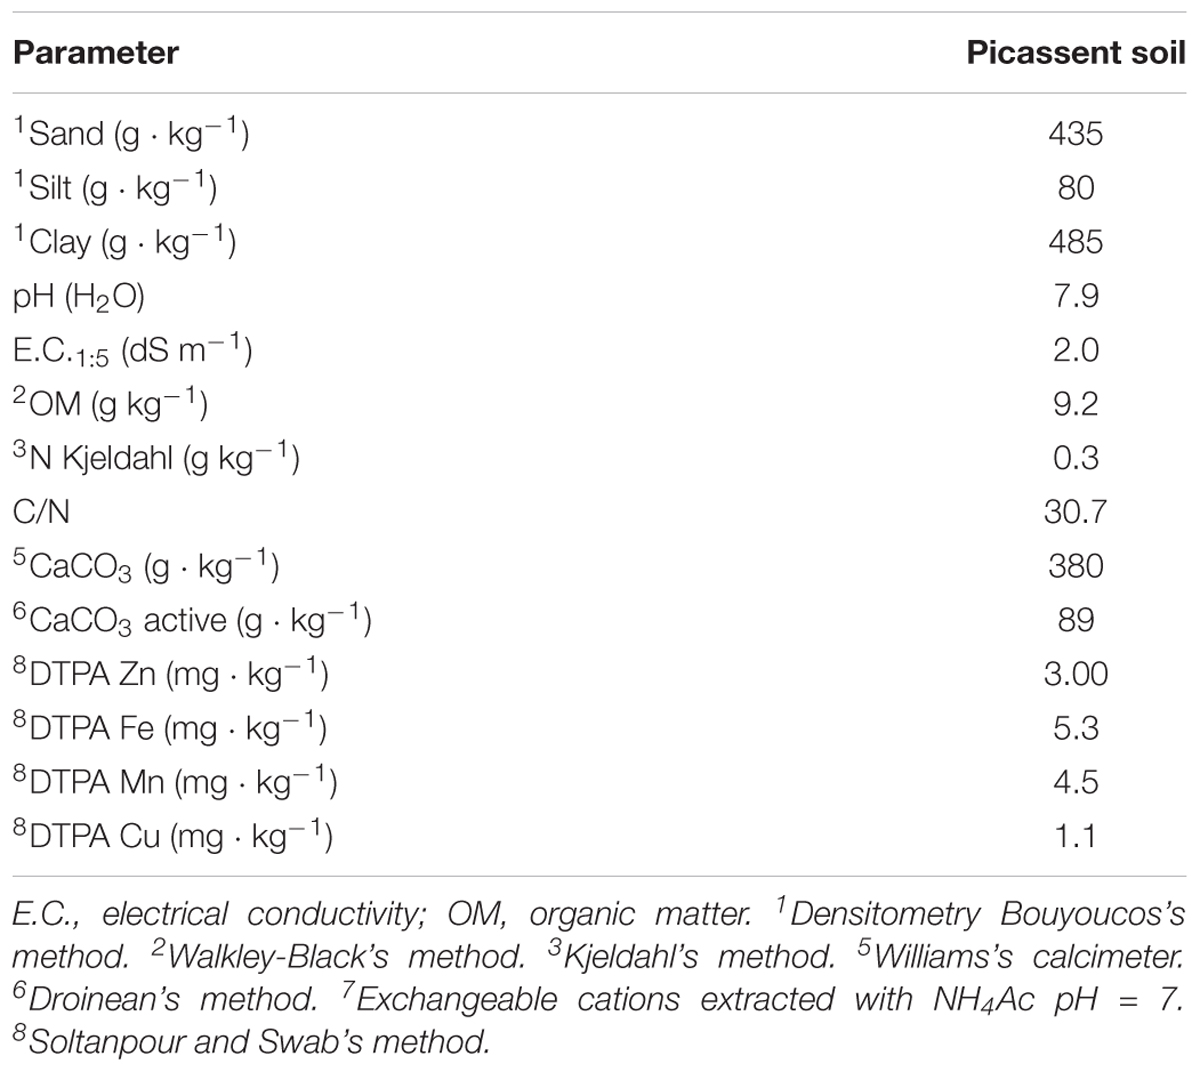 Frontiers | Eco-Friendly Iron-Humic Nanofertilizers